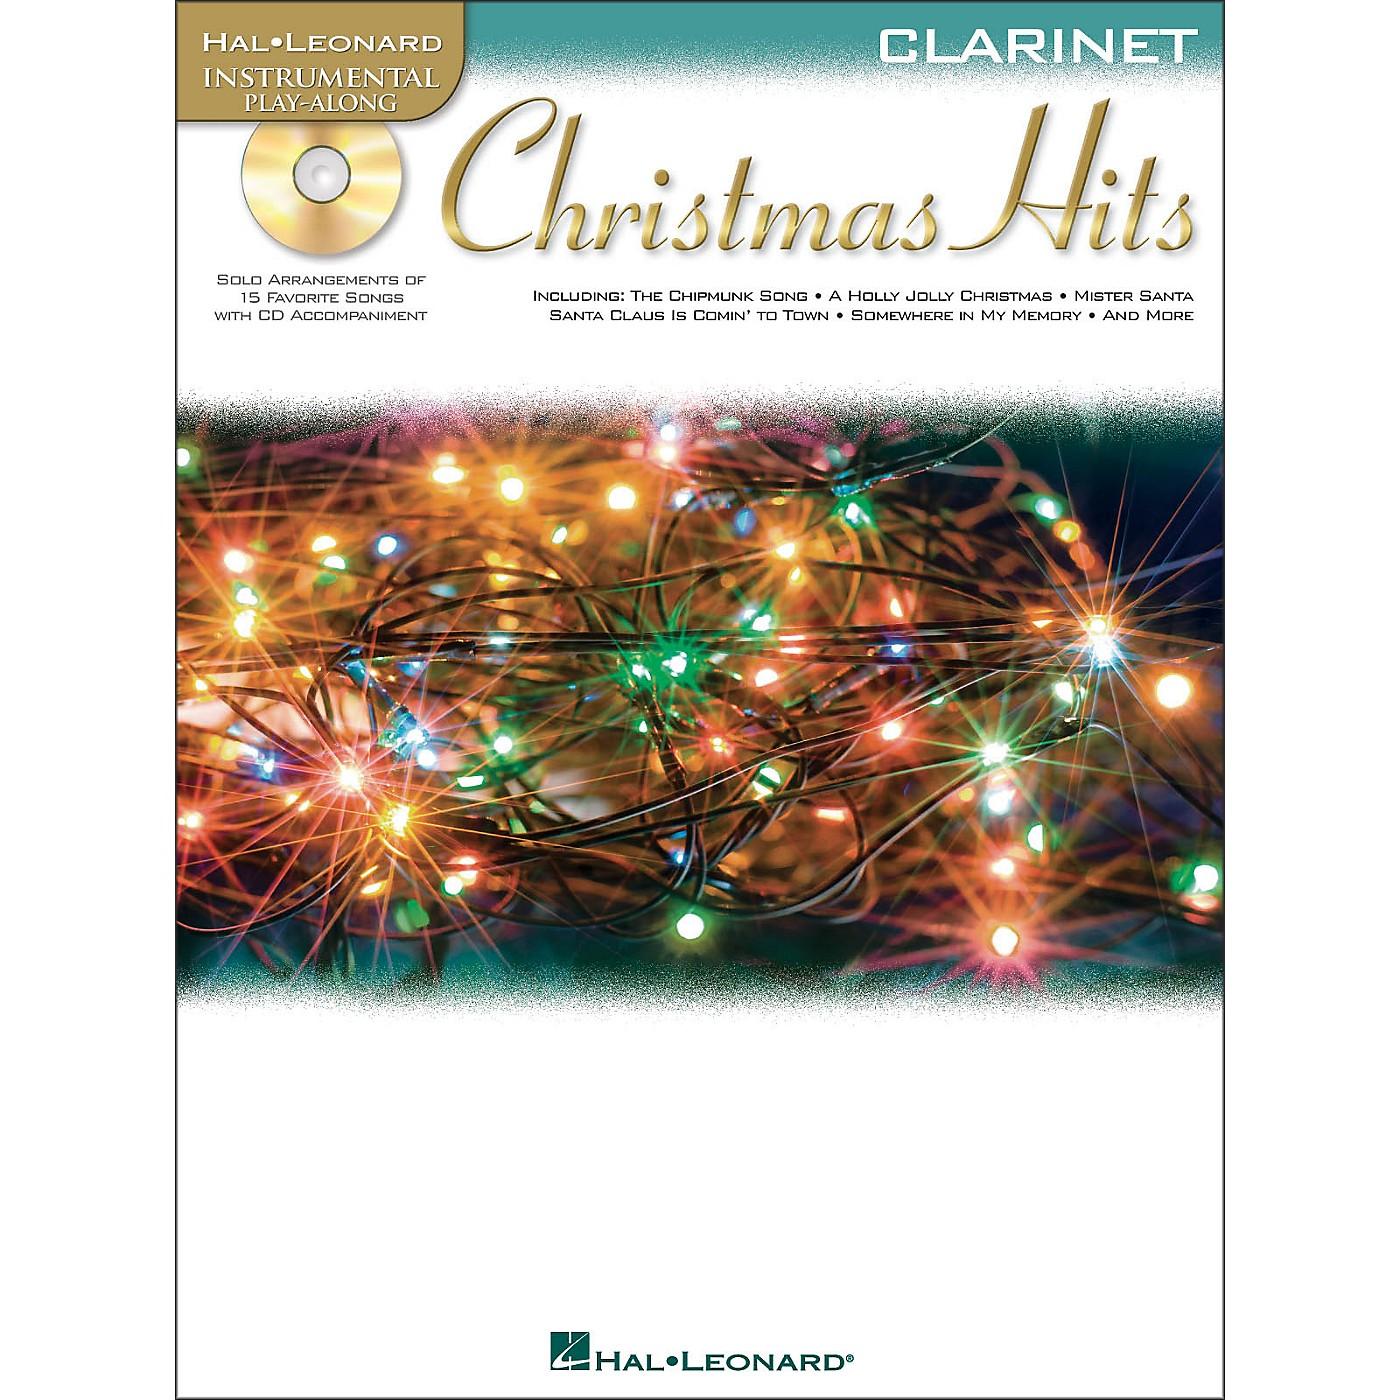 Hal Leonard Christmas Hits for Clarinet - Instrumental Play-Along Book/CD Pkg thumbnail